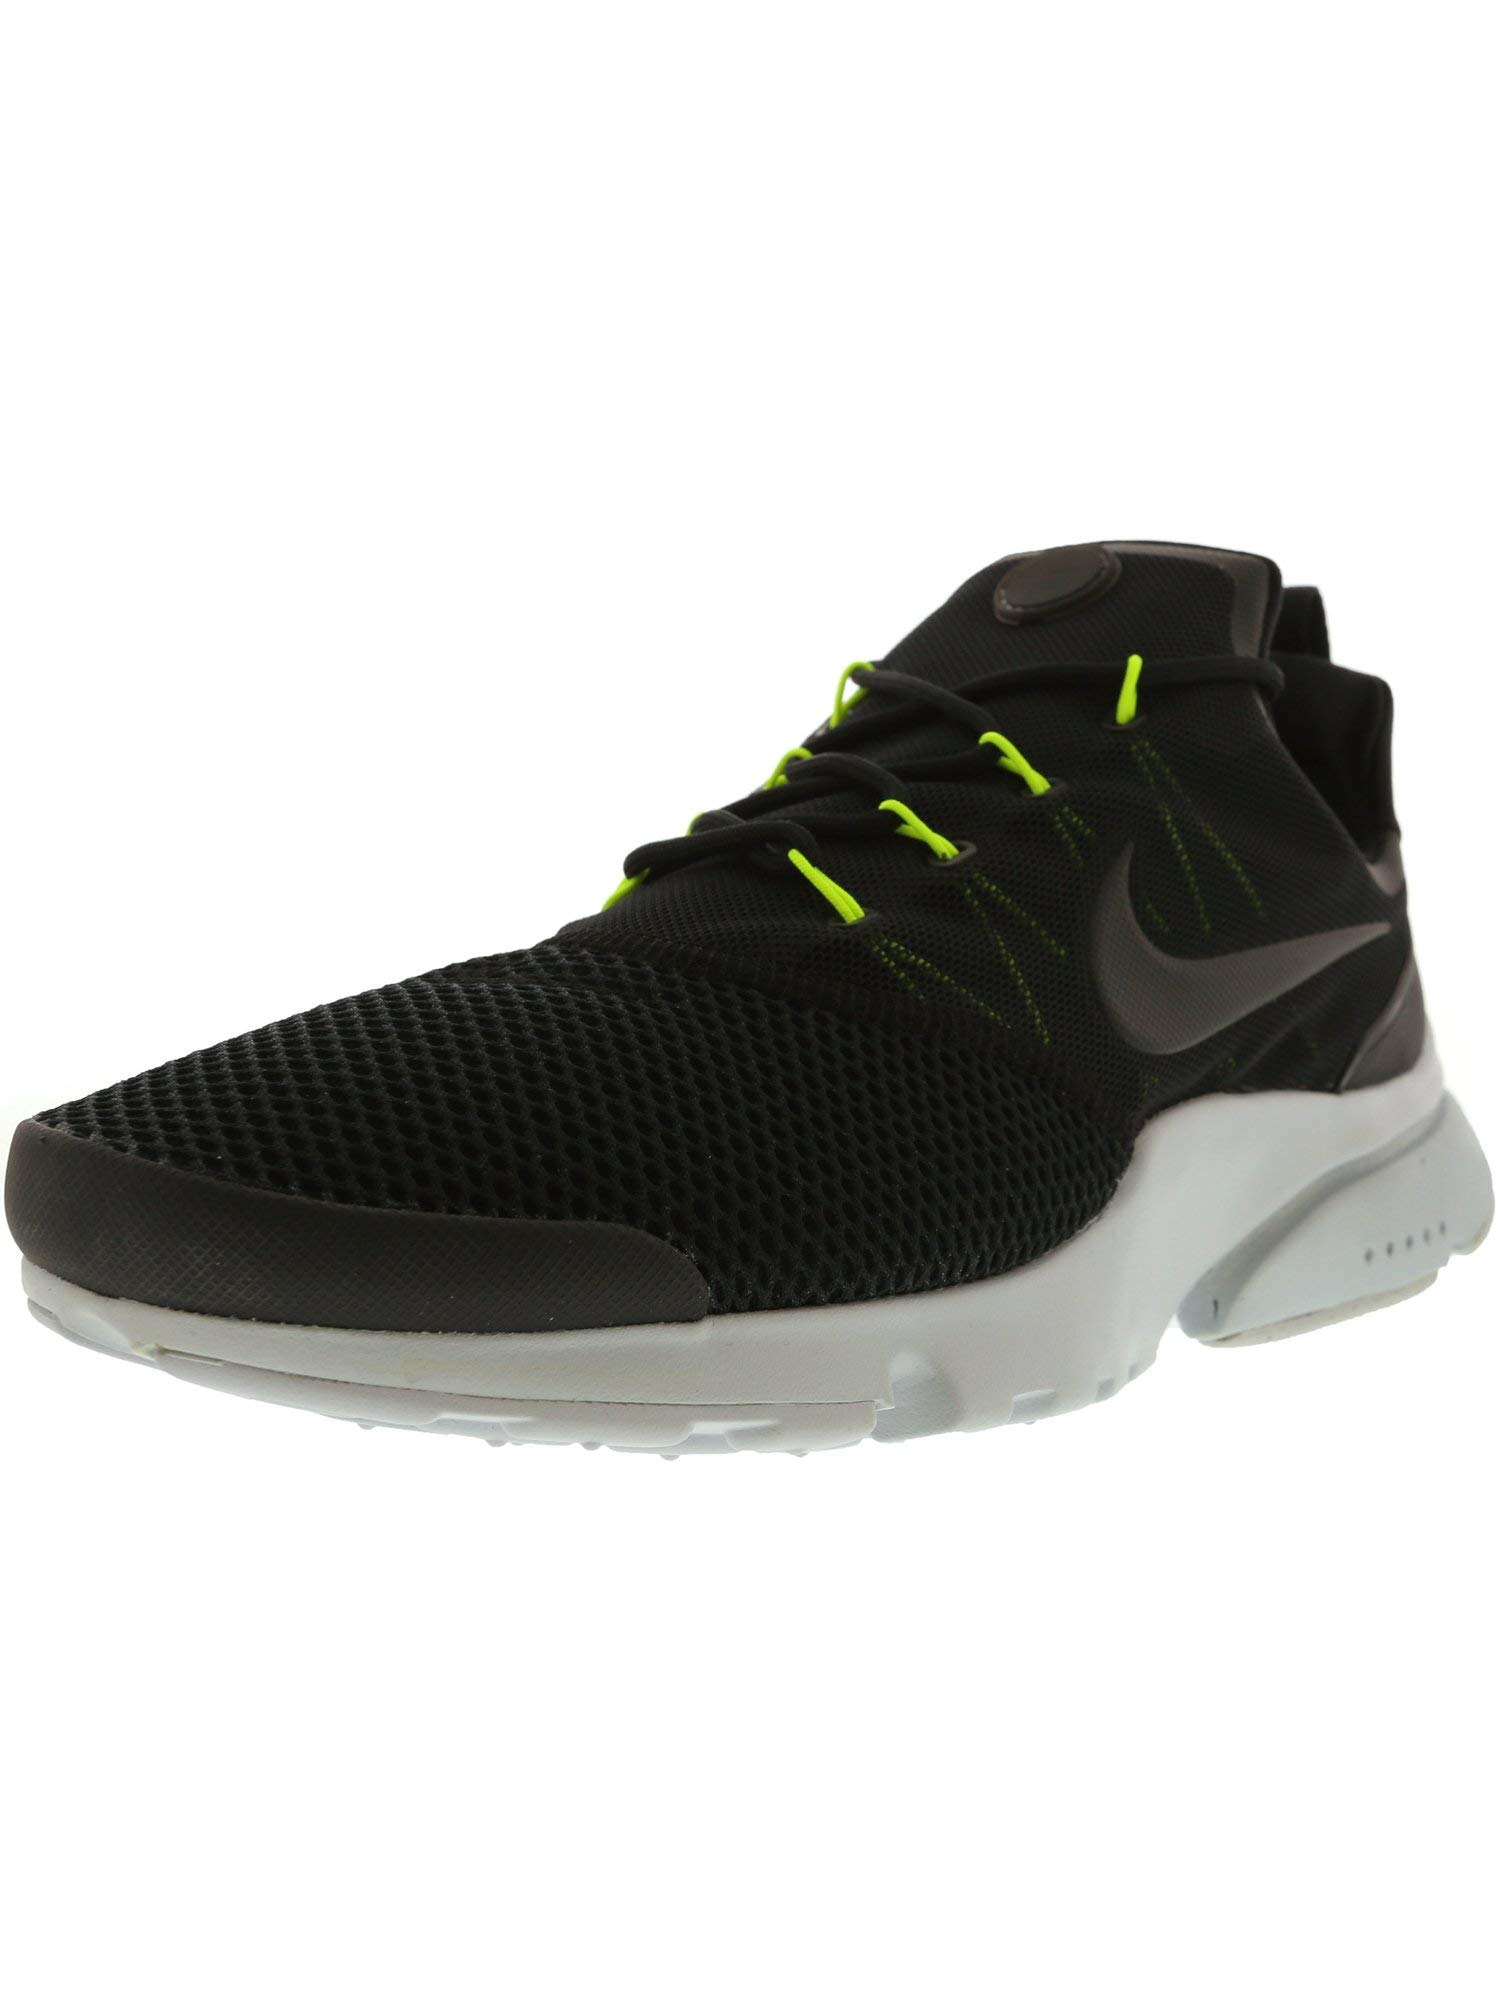 836978c72296f Nike Men's Presto Fly, Black/Black-Volt-Pure Platinum, 8 M US